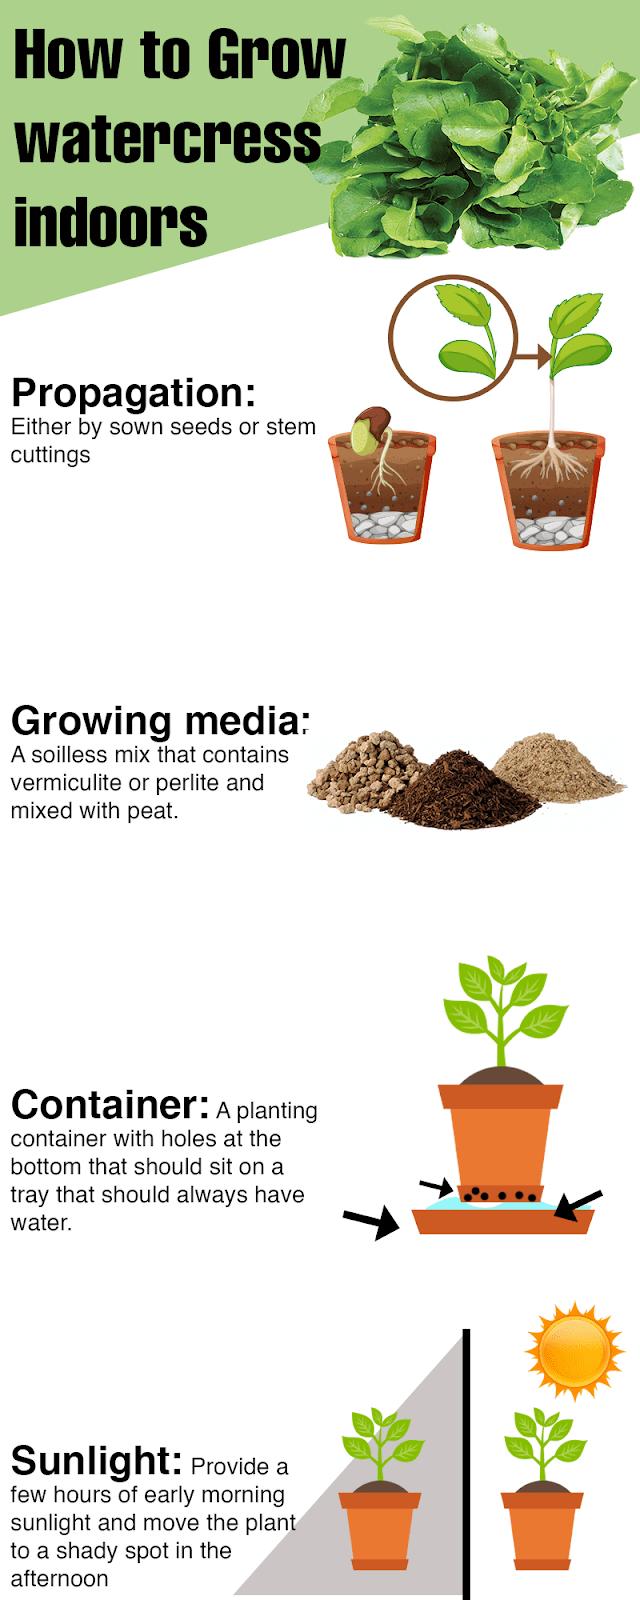 How To Grow watercress indoors